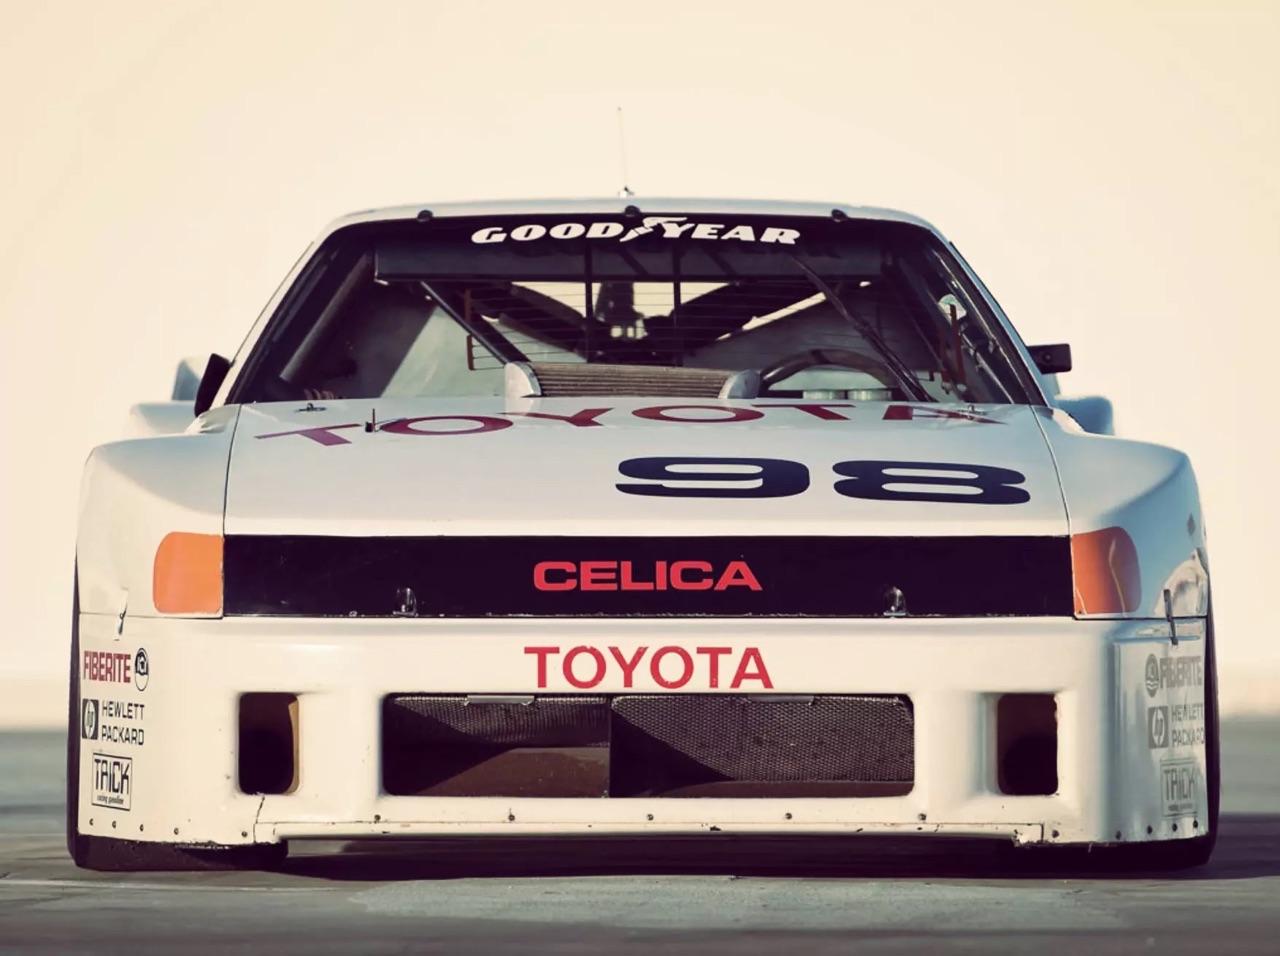 Toyota Celica Turbo IMSA GTO - 100% débridée ! 2